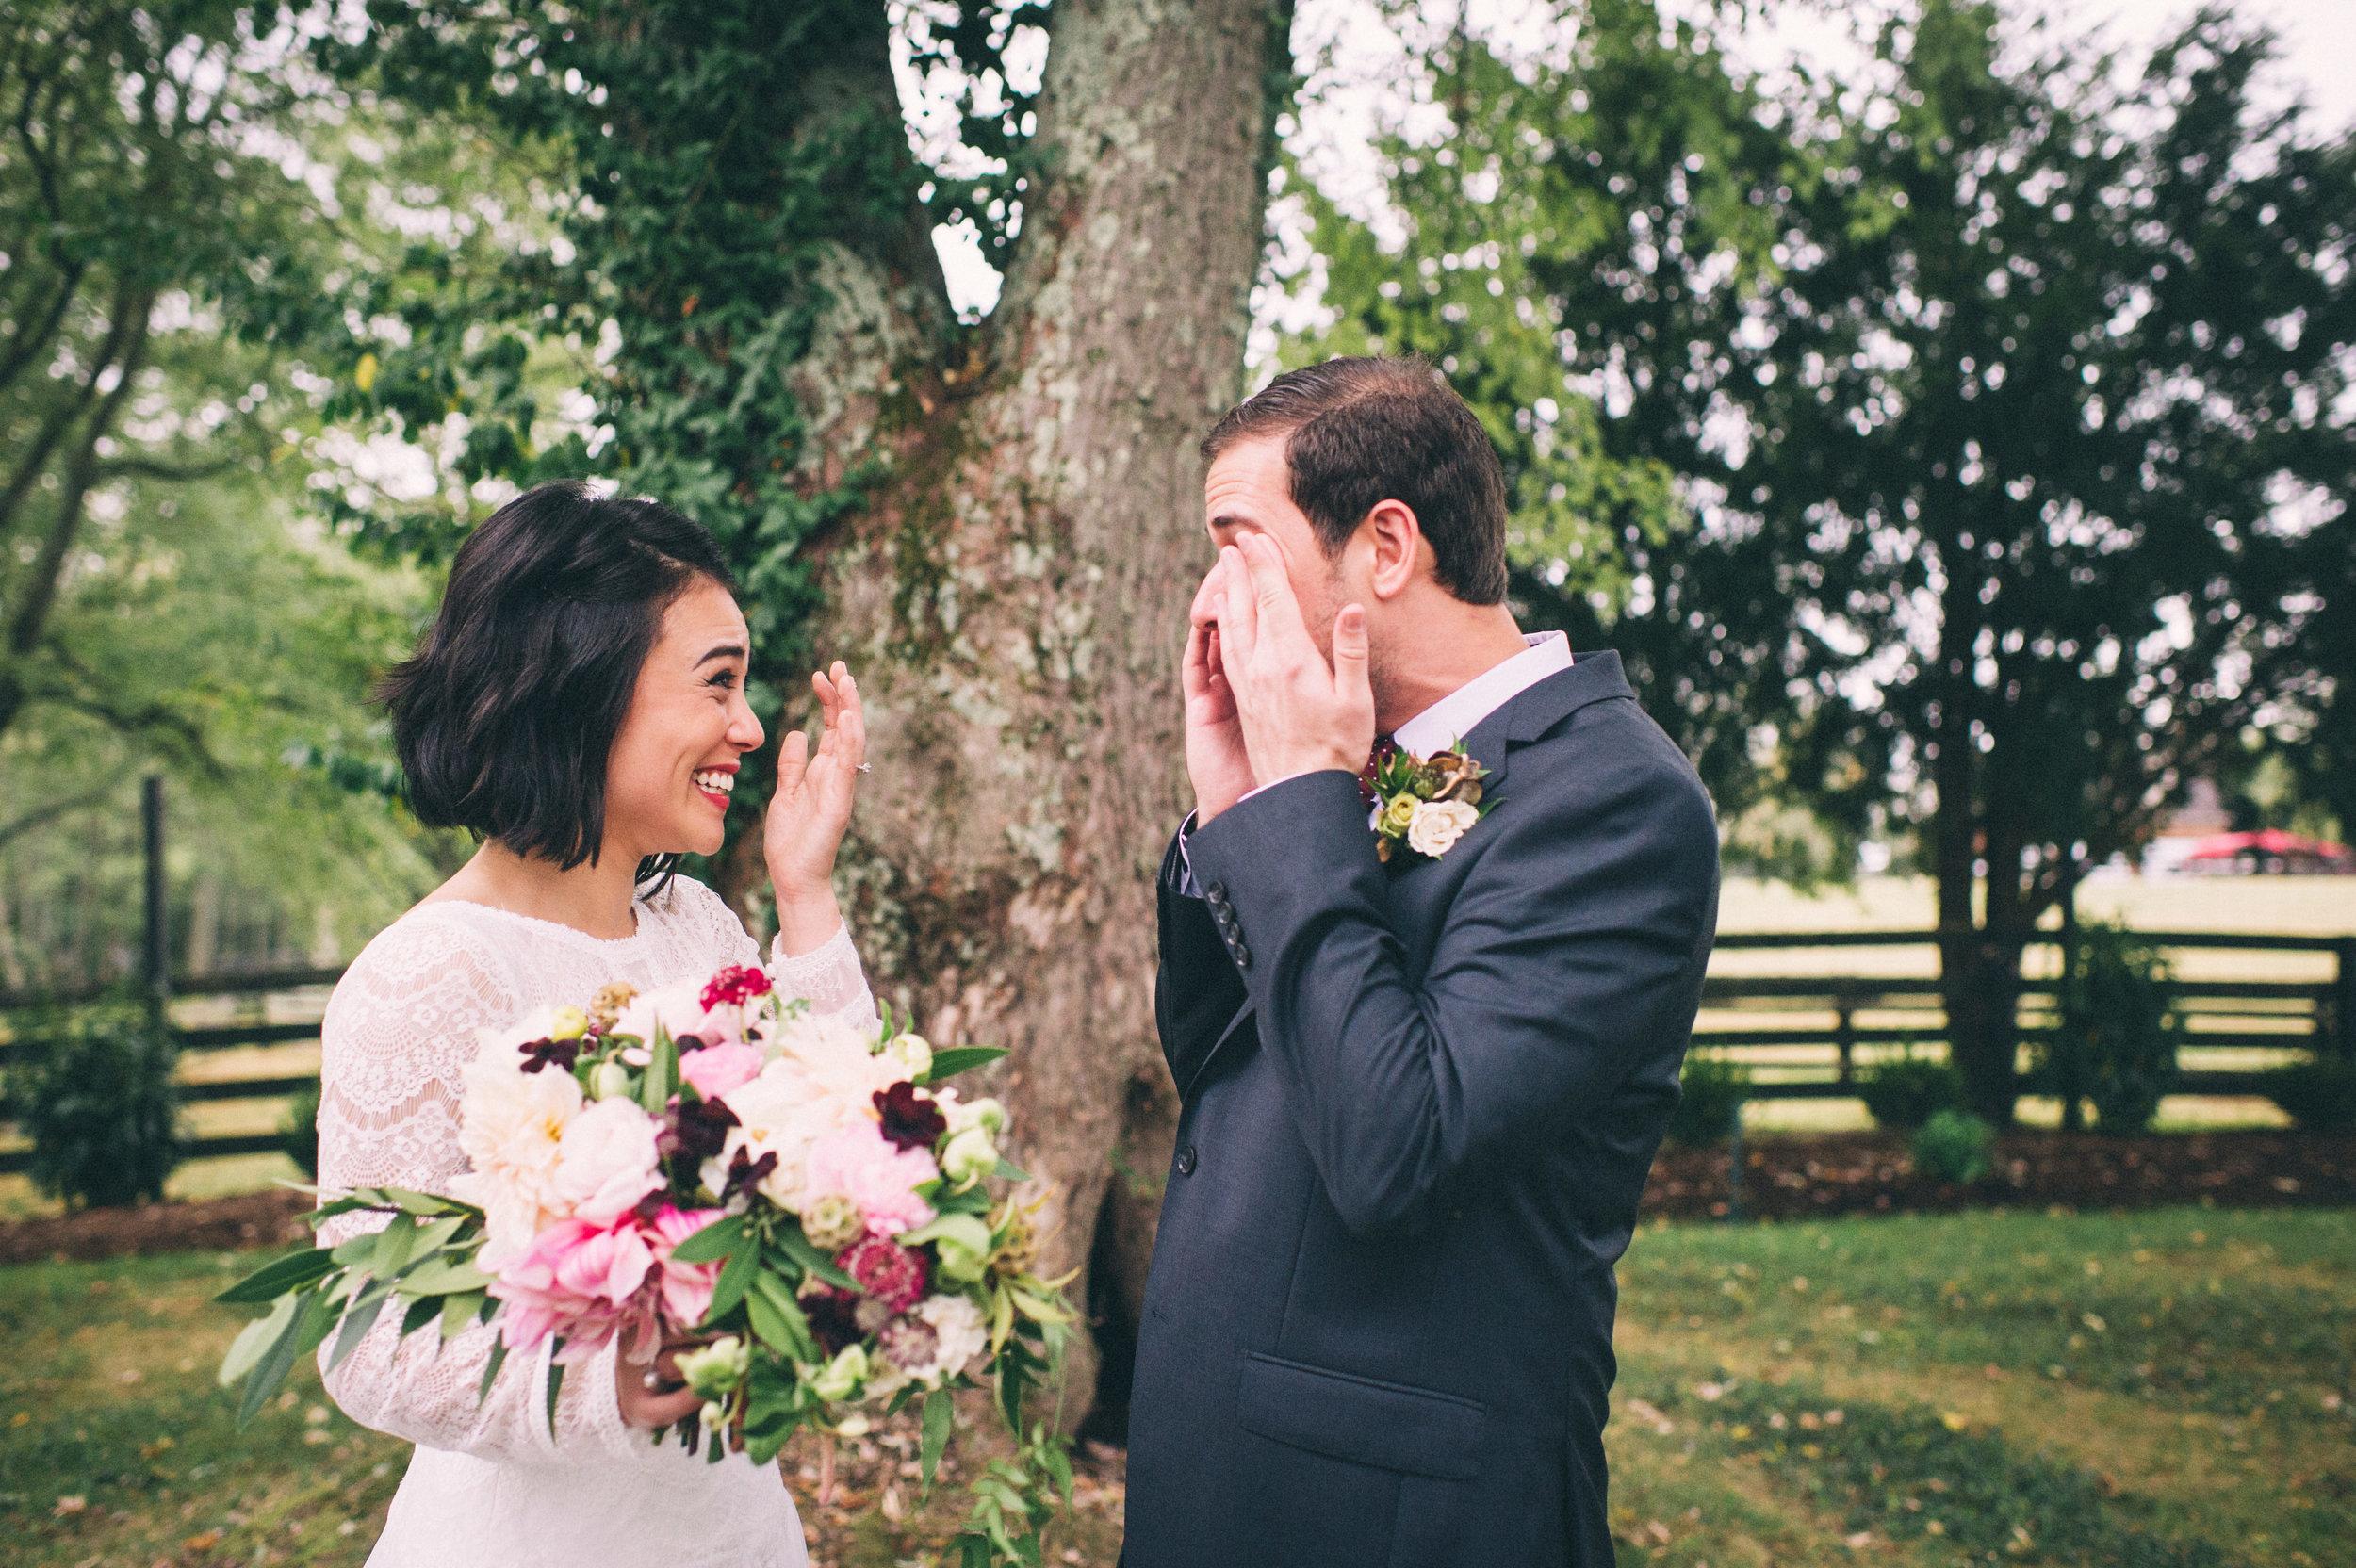 Sarah-Katherine-Davis-Photography-Louisville-Kentucky-Wedding-Photographer-Blush-Greens-Outdoor-Burgundy